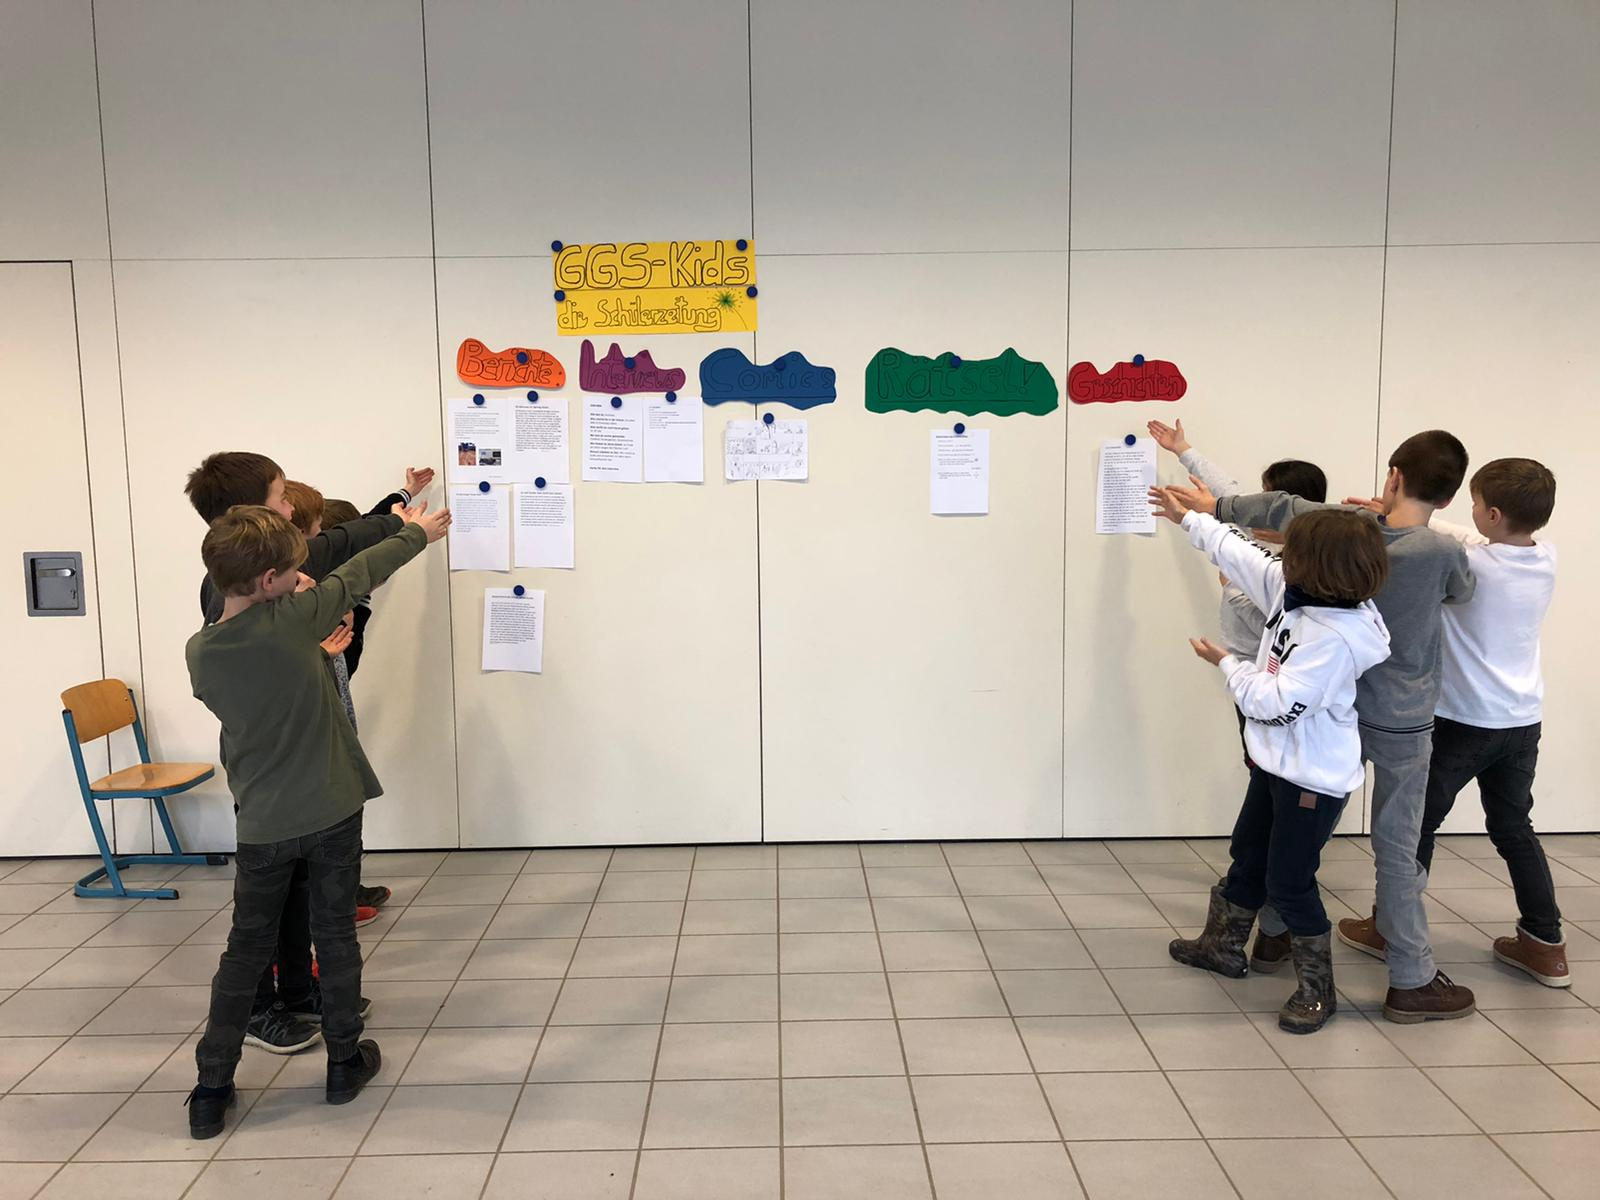 GGS Kids – unsere Schülerzeitung